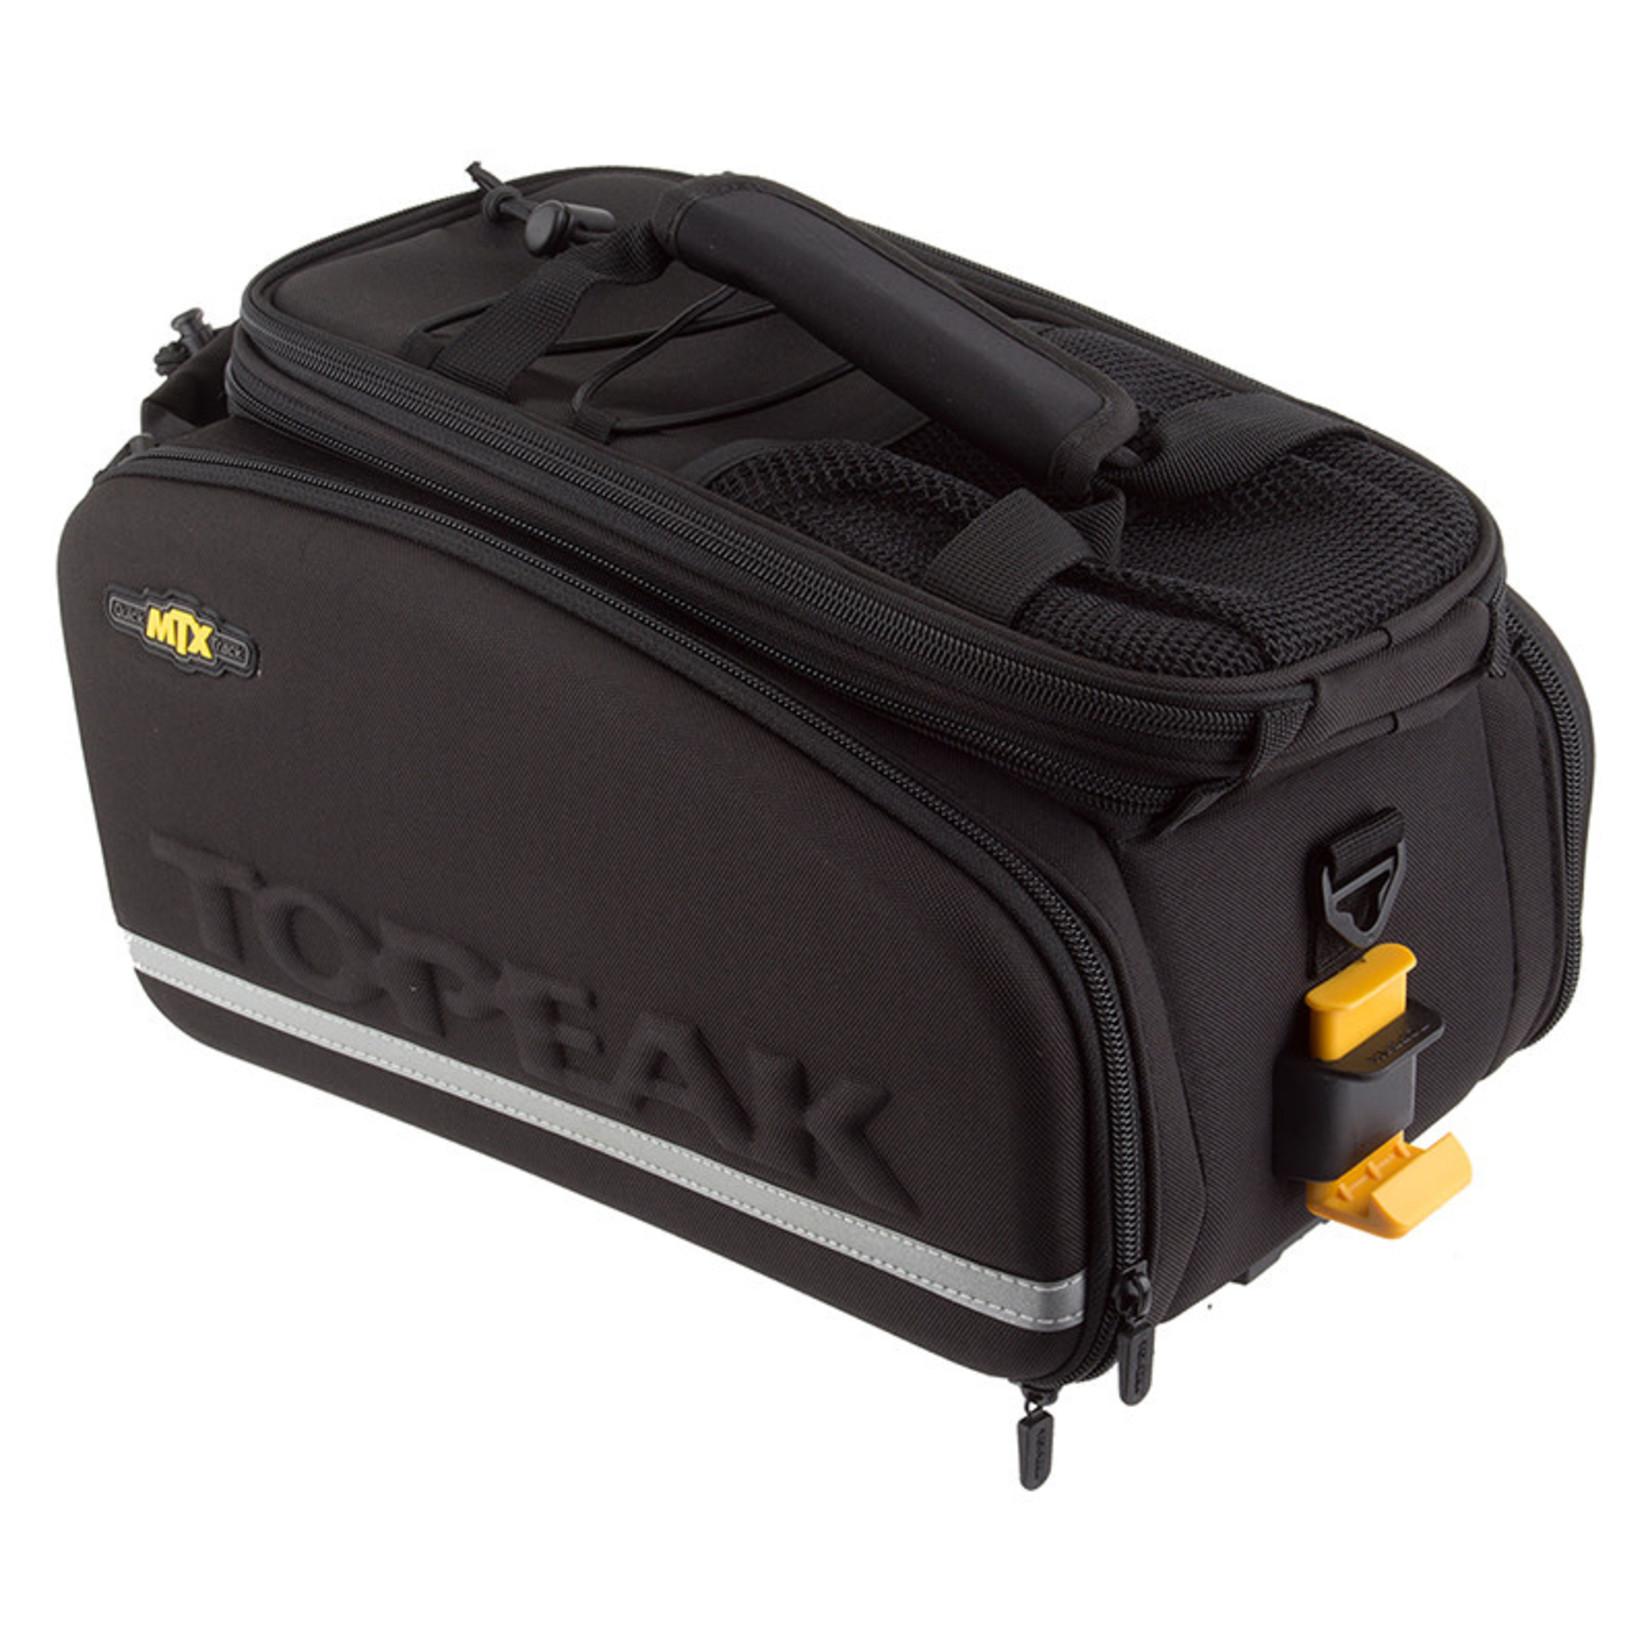 Topeak Topeak MTX TrunkBag DXP Rack Bag with Expandable Panniers: 22.6 Liter, Black